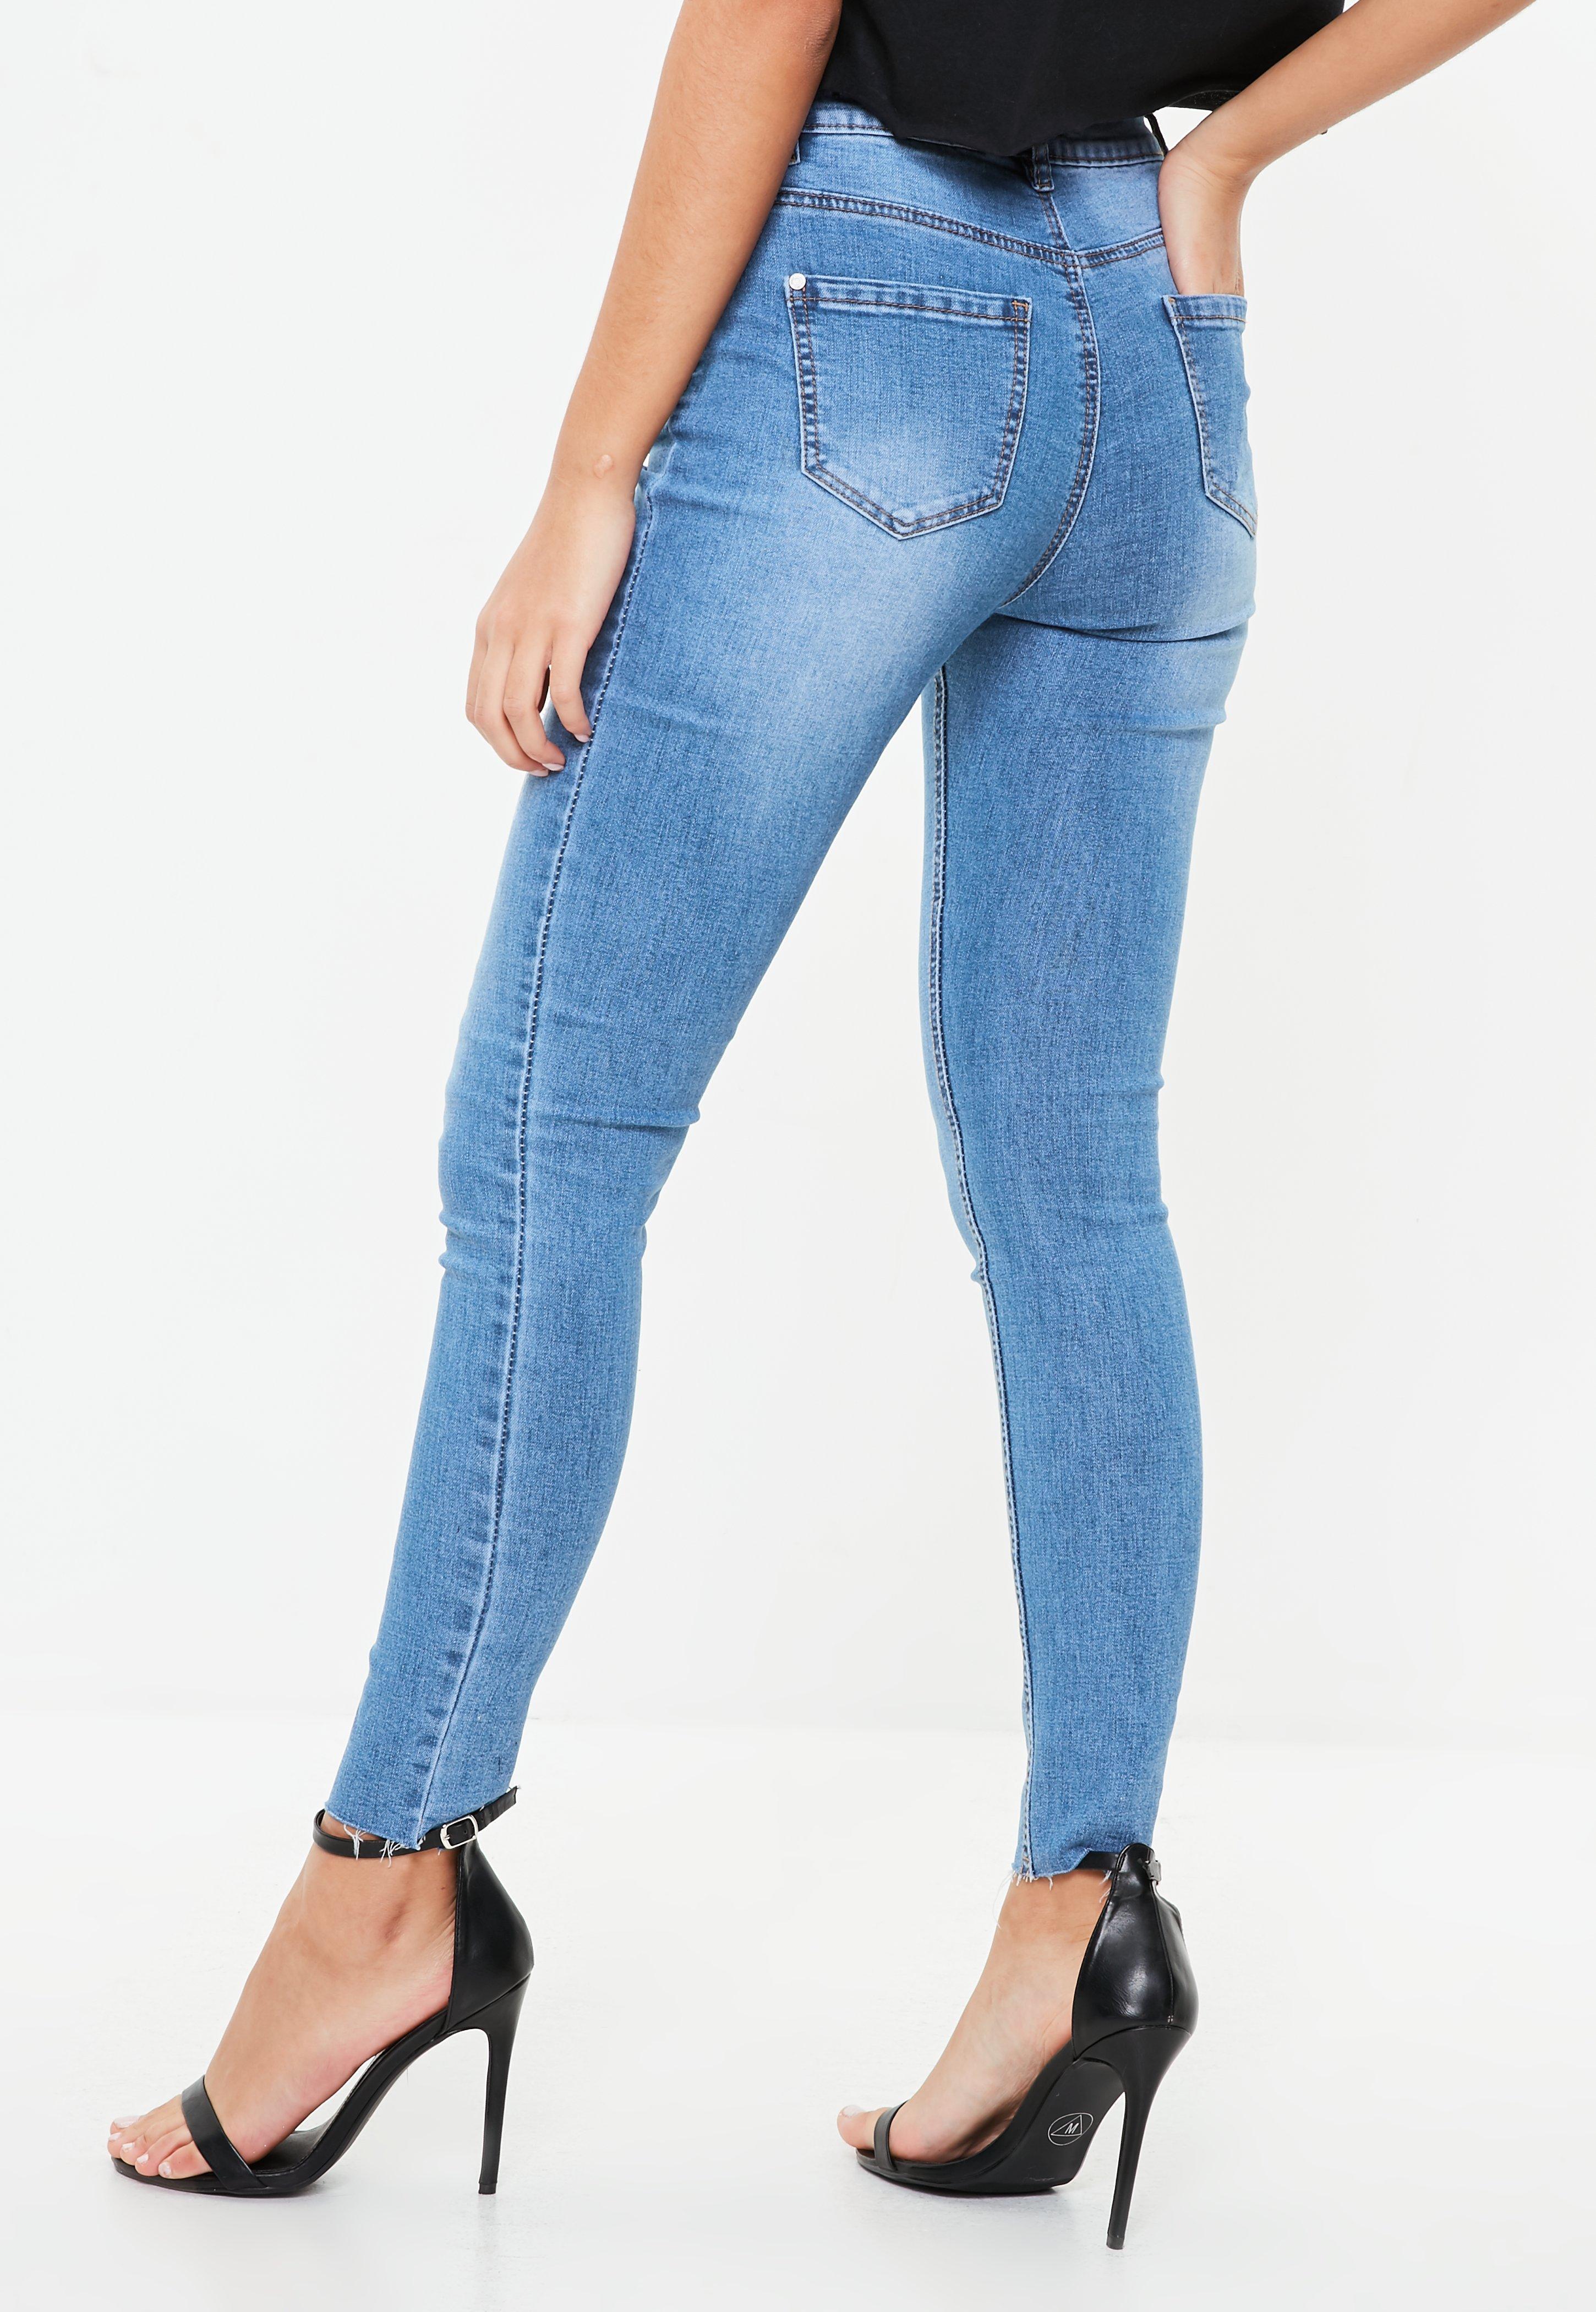 8adbe566f39e4 Missguided - Blue Sinner Clean Distressed Skinny Jeans - Lyst. View  fullscreen